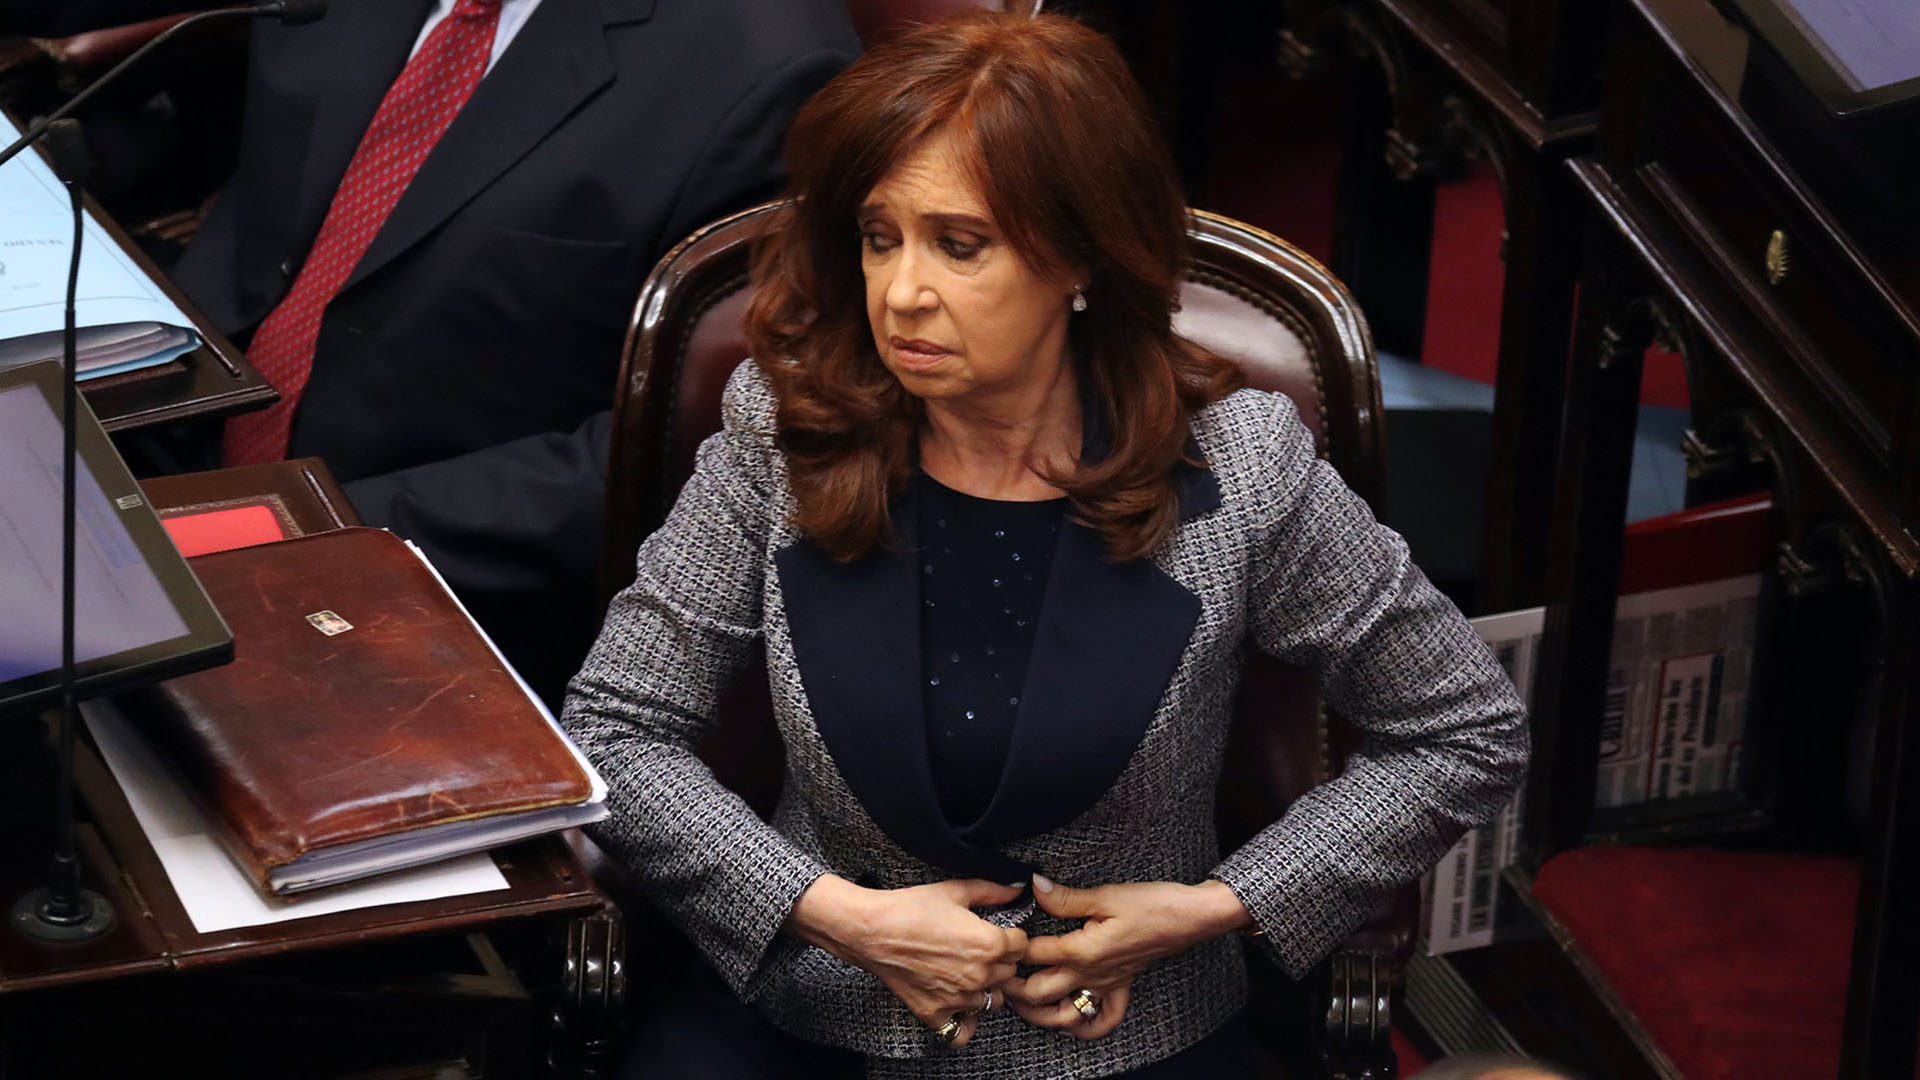 La ex presidenta y actual senadora Cristina Kirchner